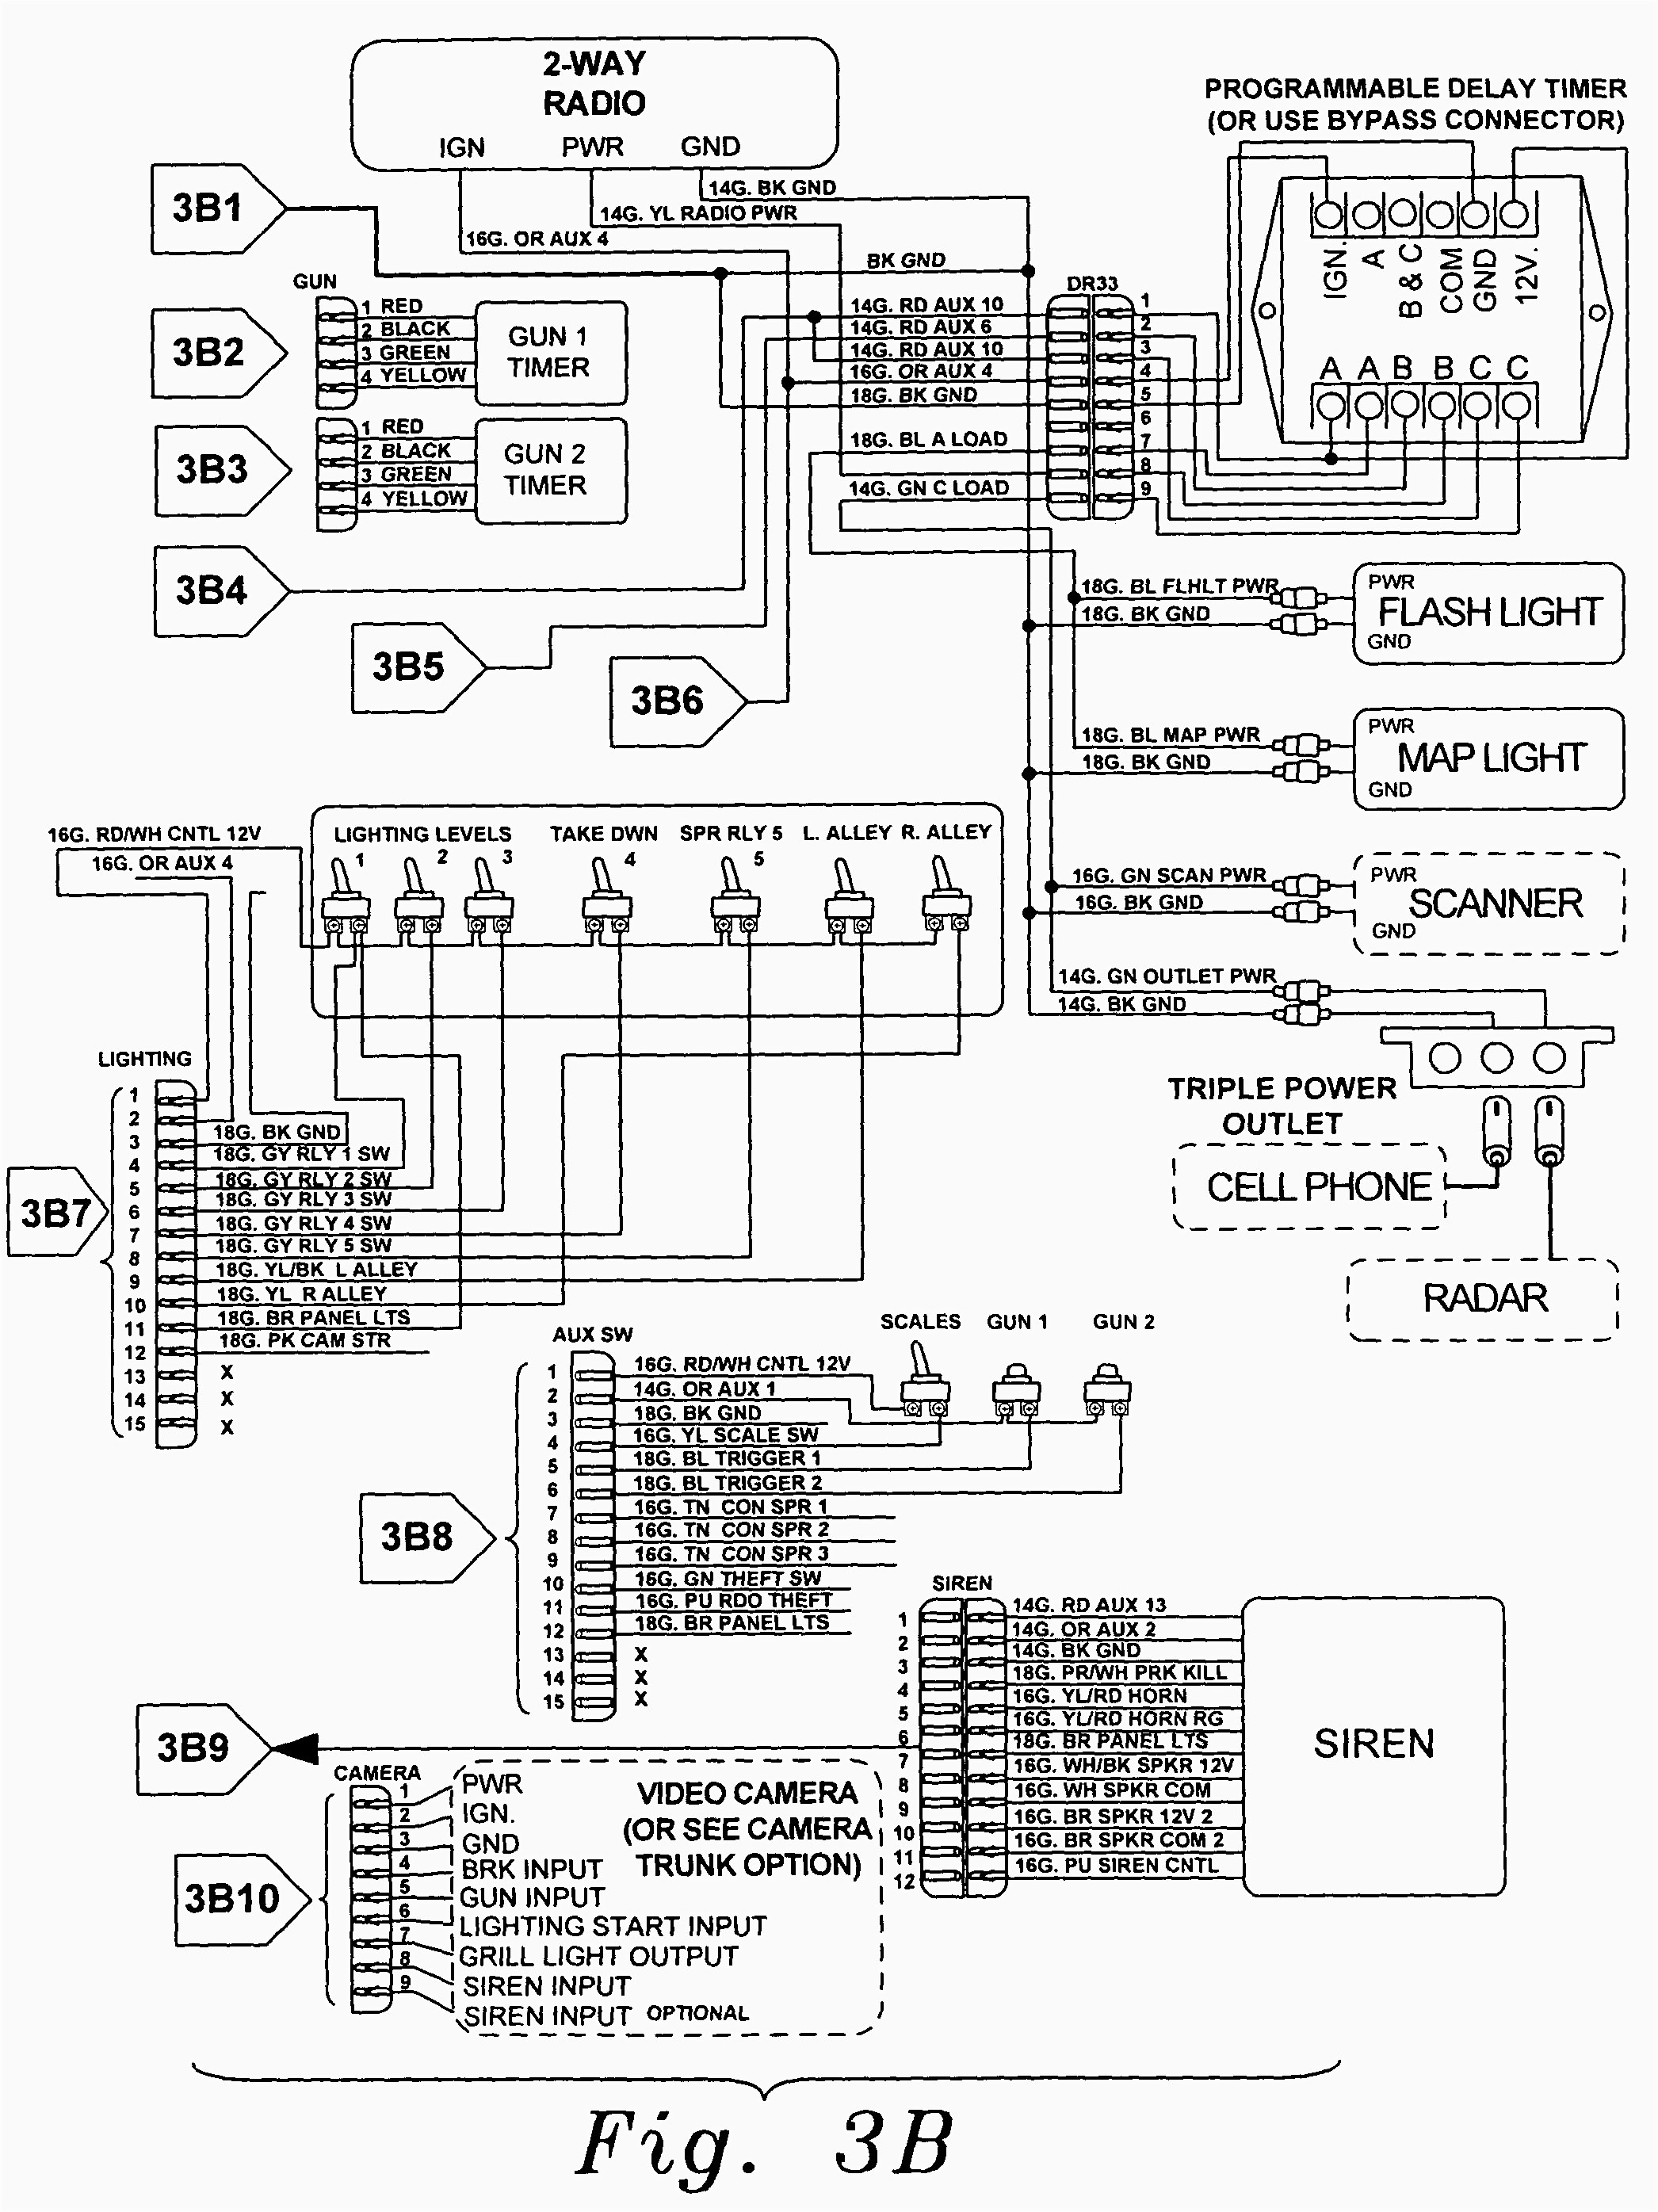 Whelen Linear Strobe Wiring Diagram - Wiring Diagramsself.pot.lesvignoblesguimberteau.fr